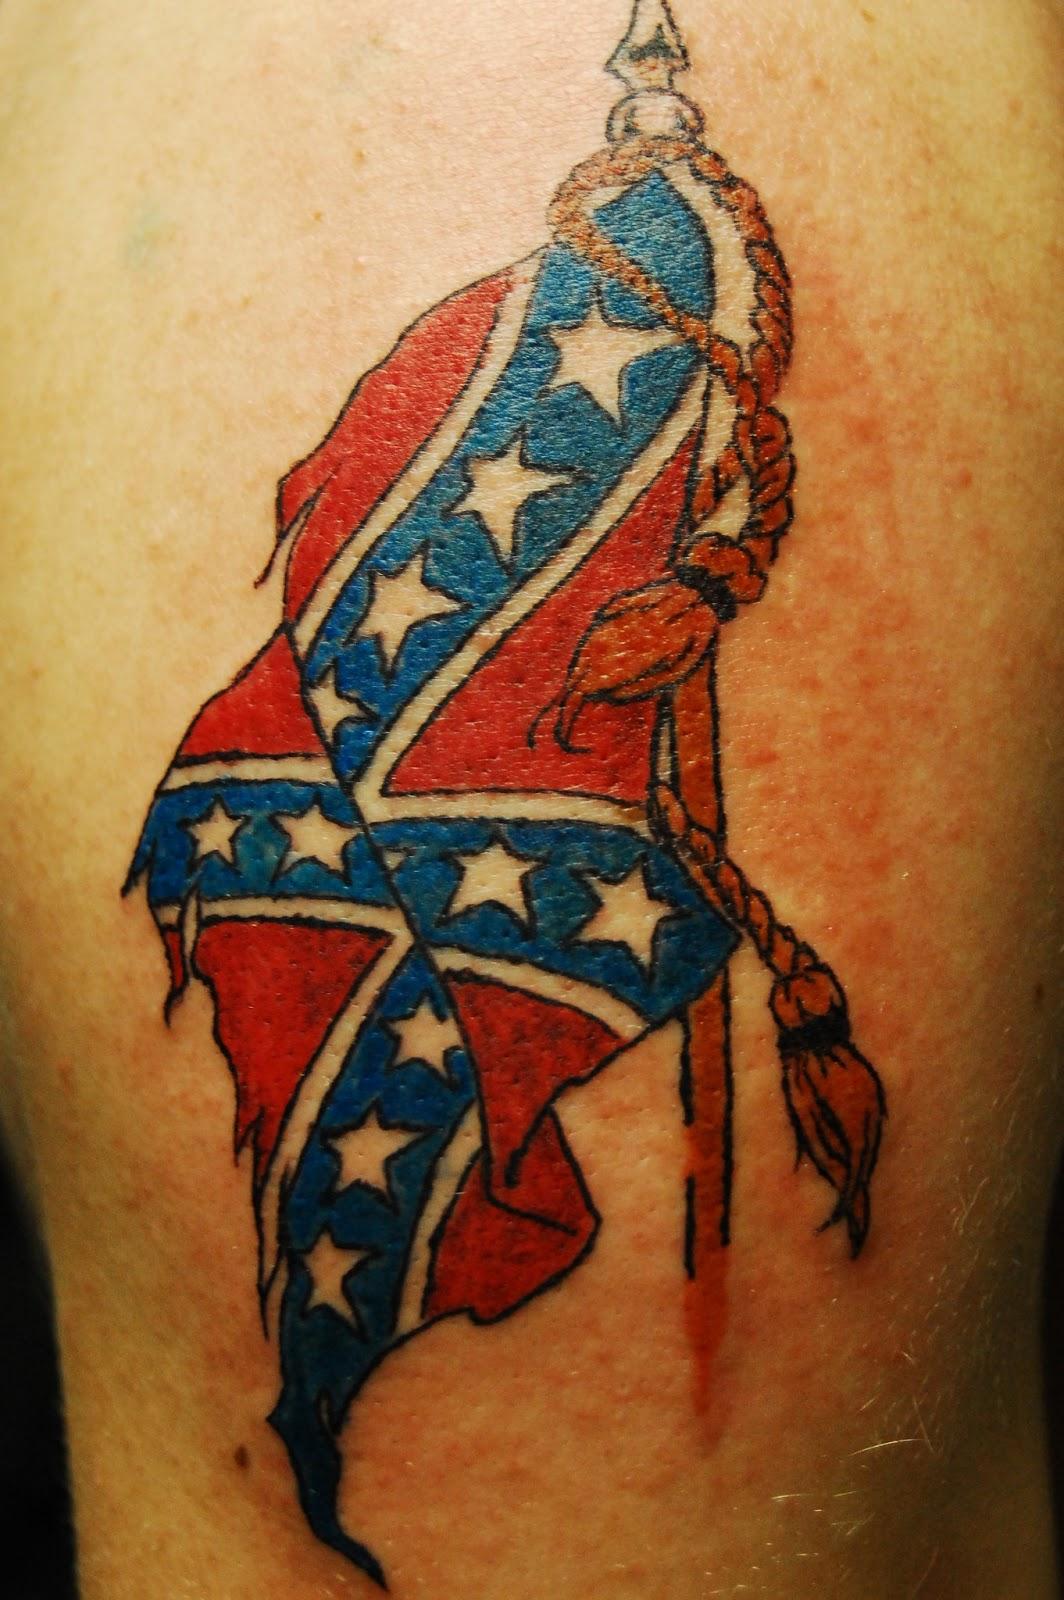 My Tattoo Designs: Confederate Flag Tattoos